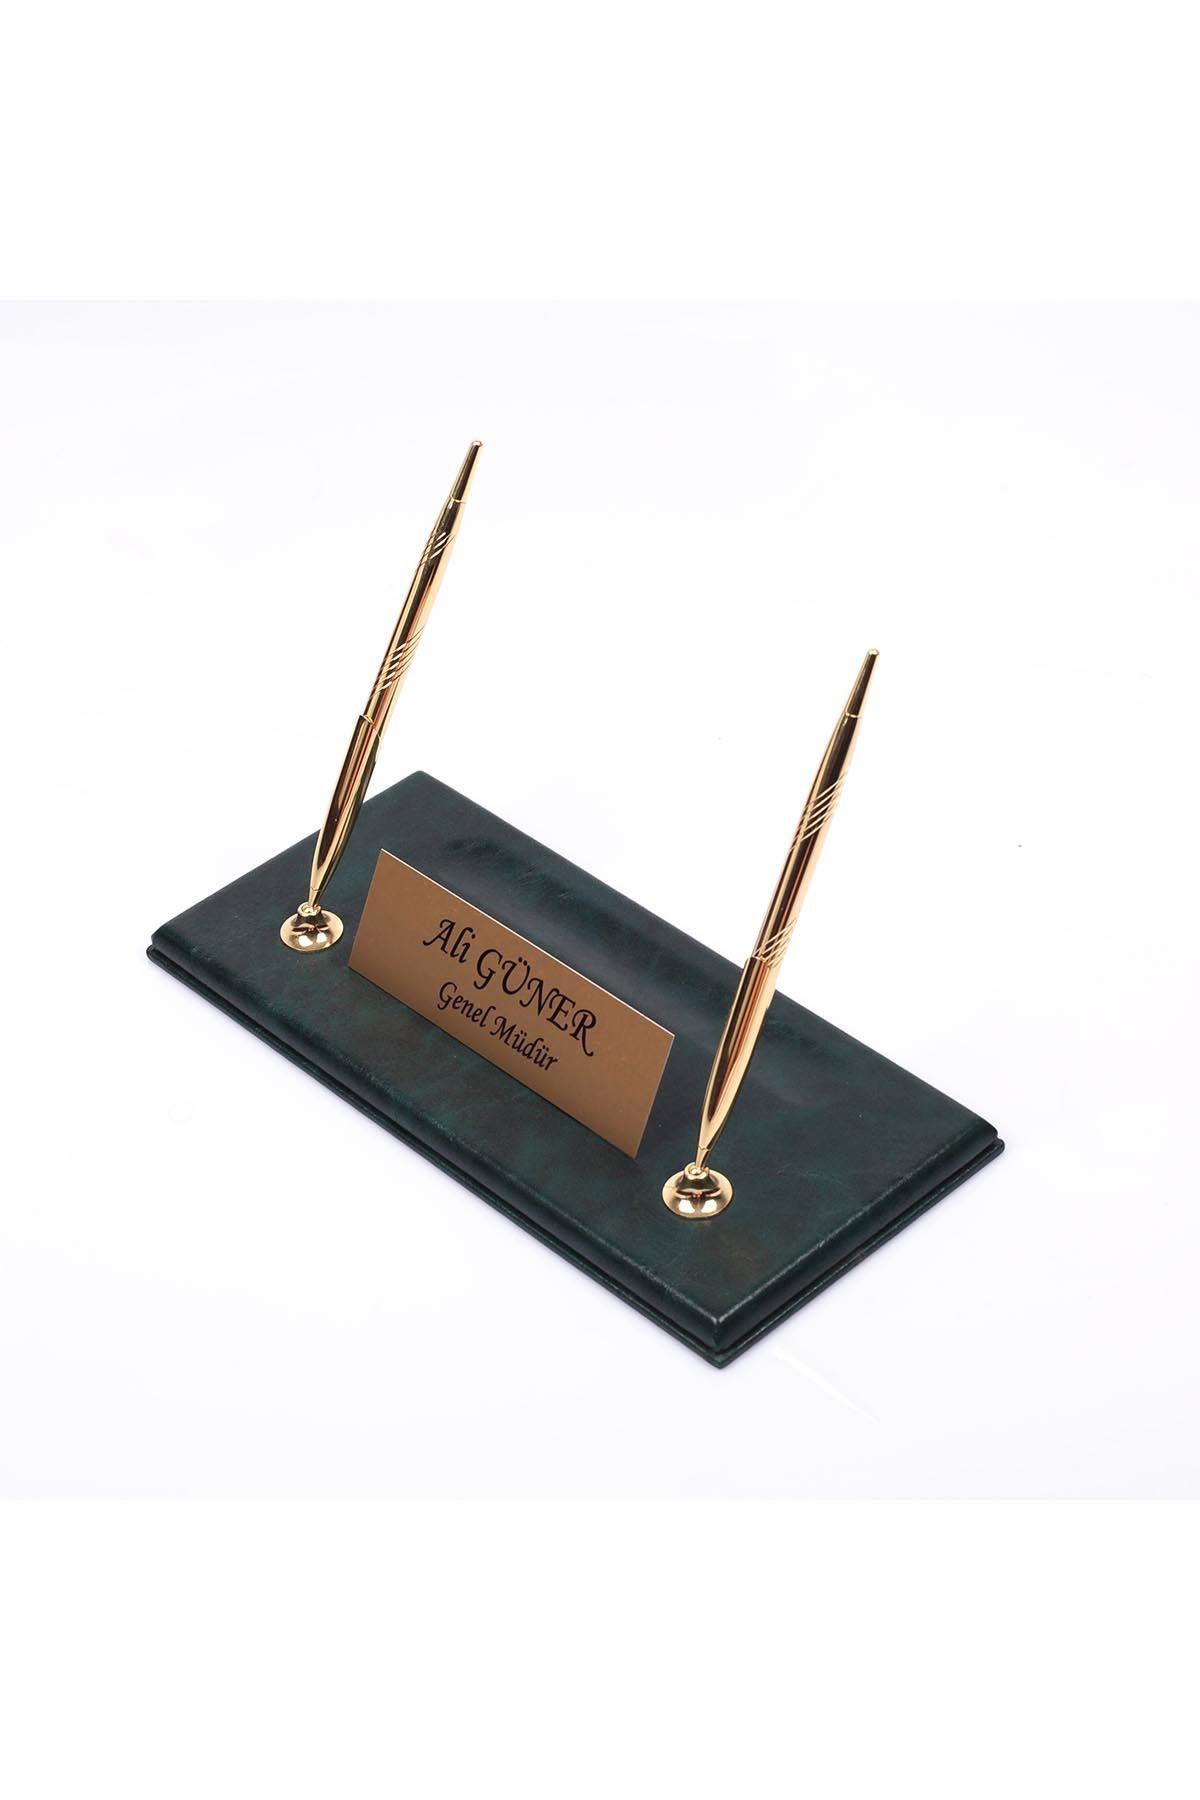 Leather Manager Pen Base Green| Name Plate | Golden Pen Base | Desk Accessories